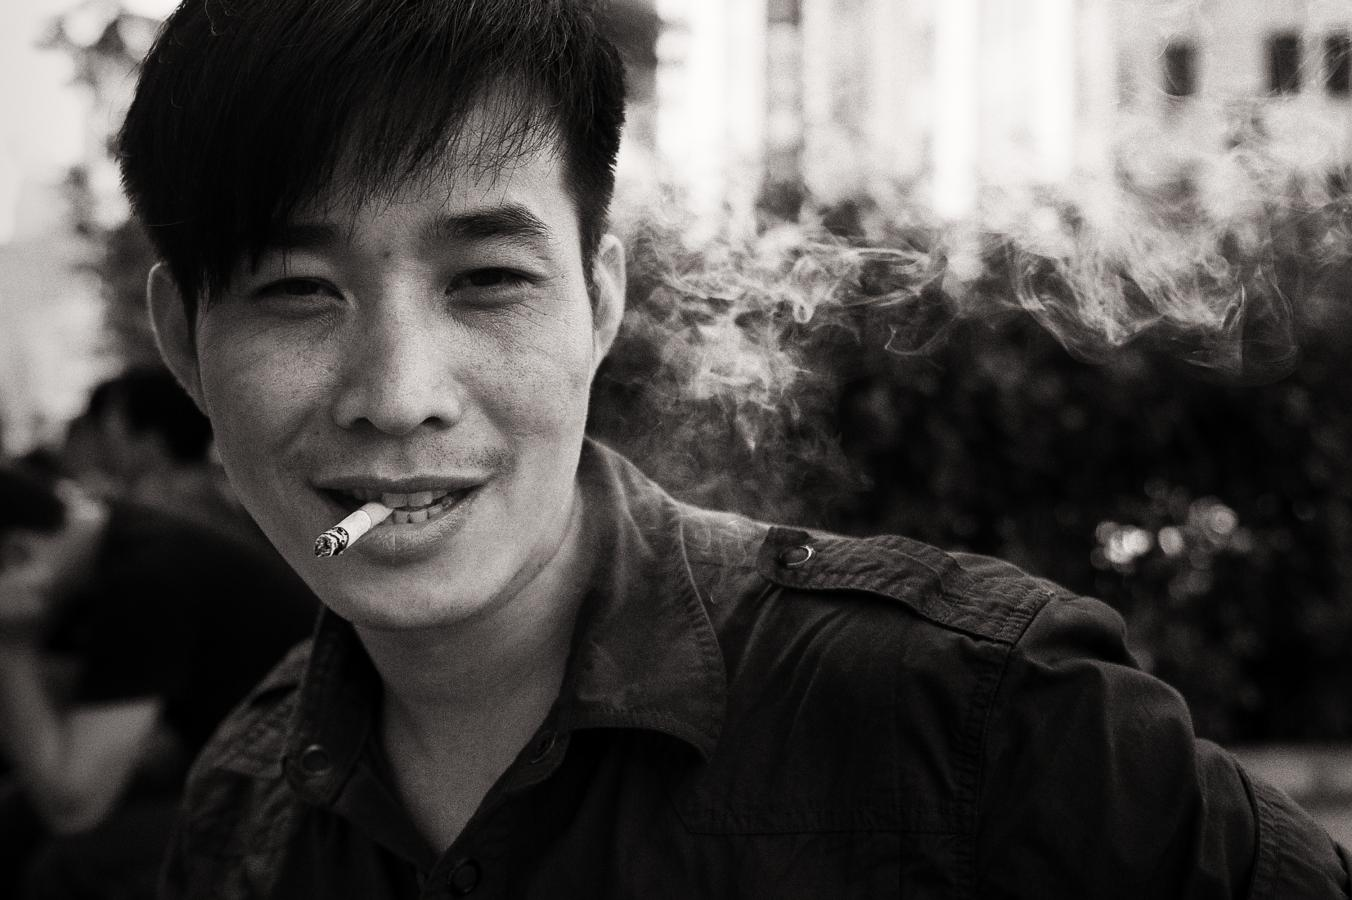 smoking-yan-wu-shanghai-2010